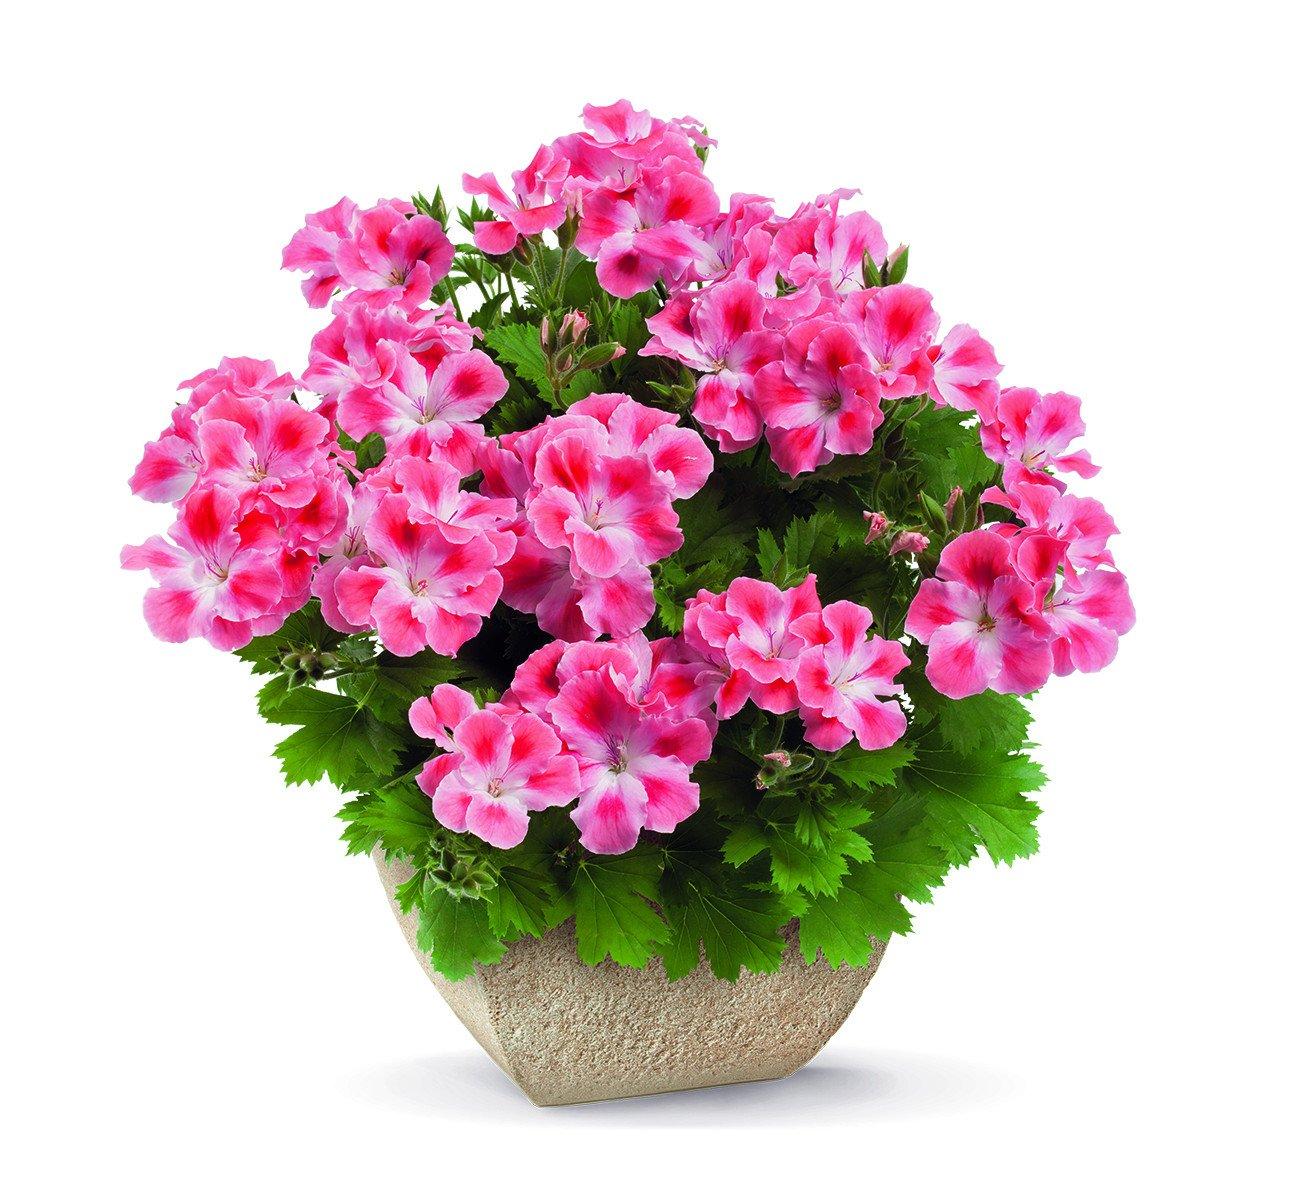 pac_Candy_Flowers_Peach_Cloud_13708_CMYK_Presse.jpg